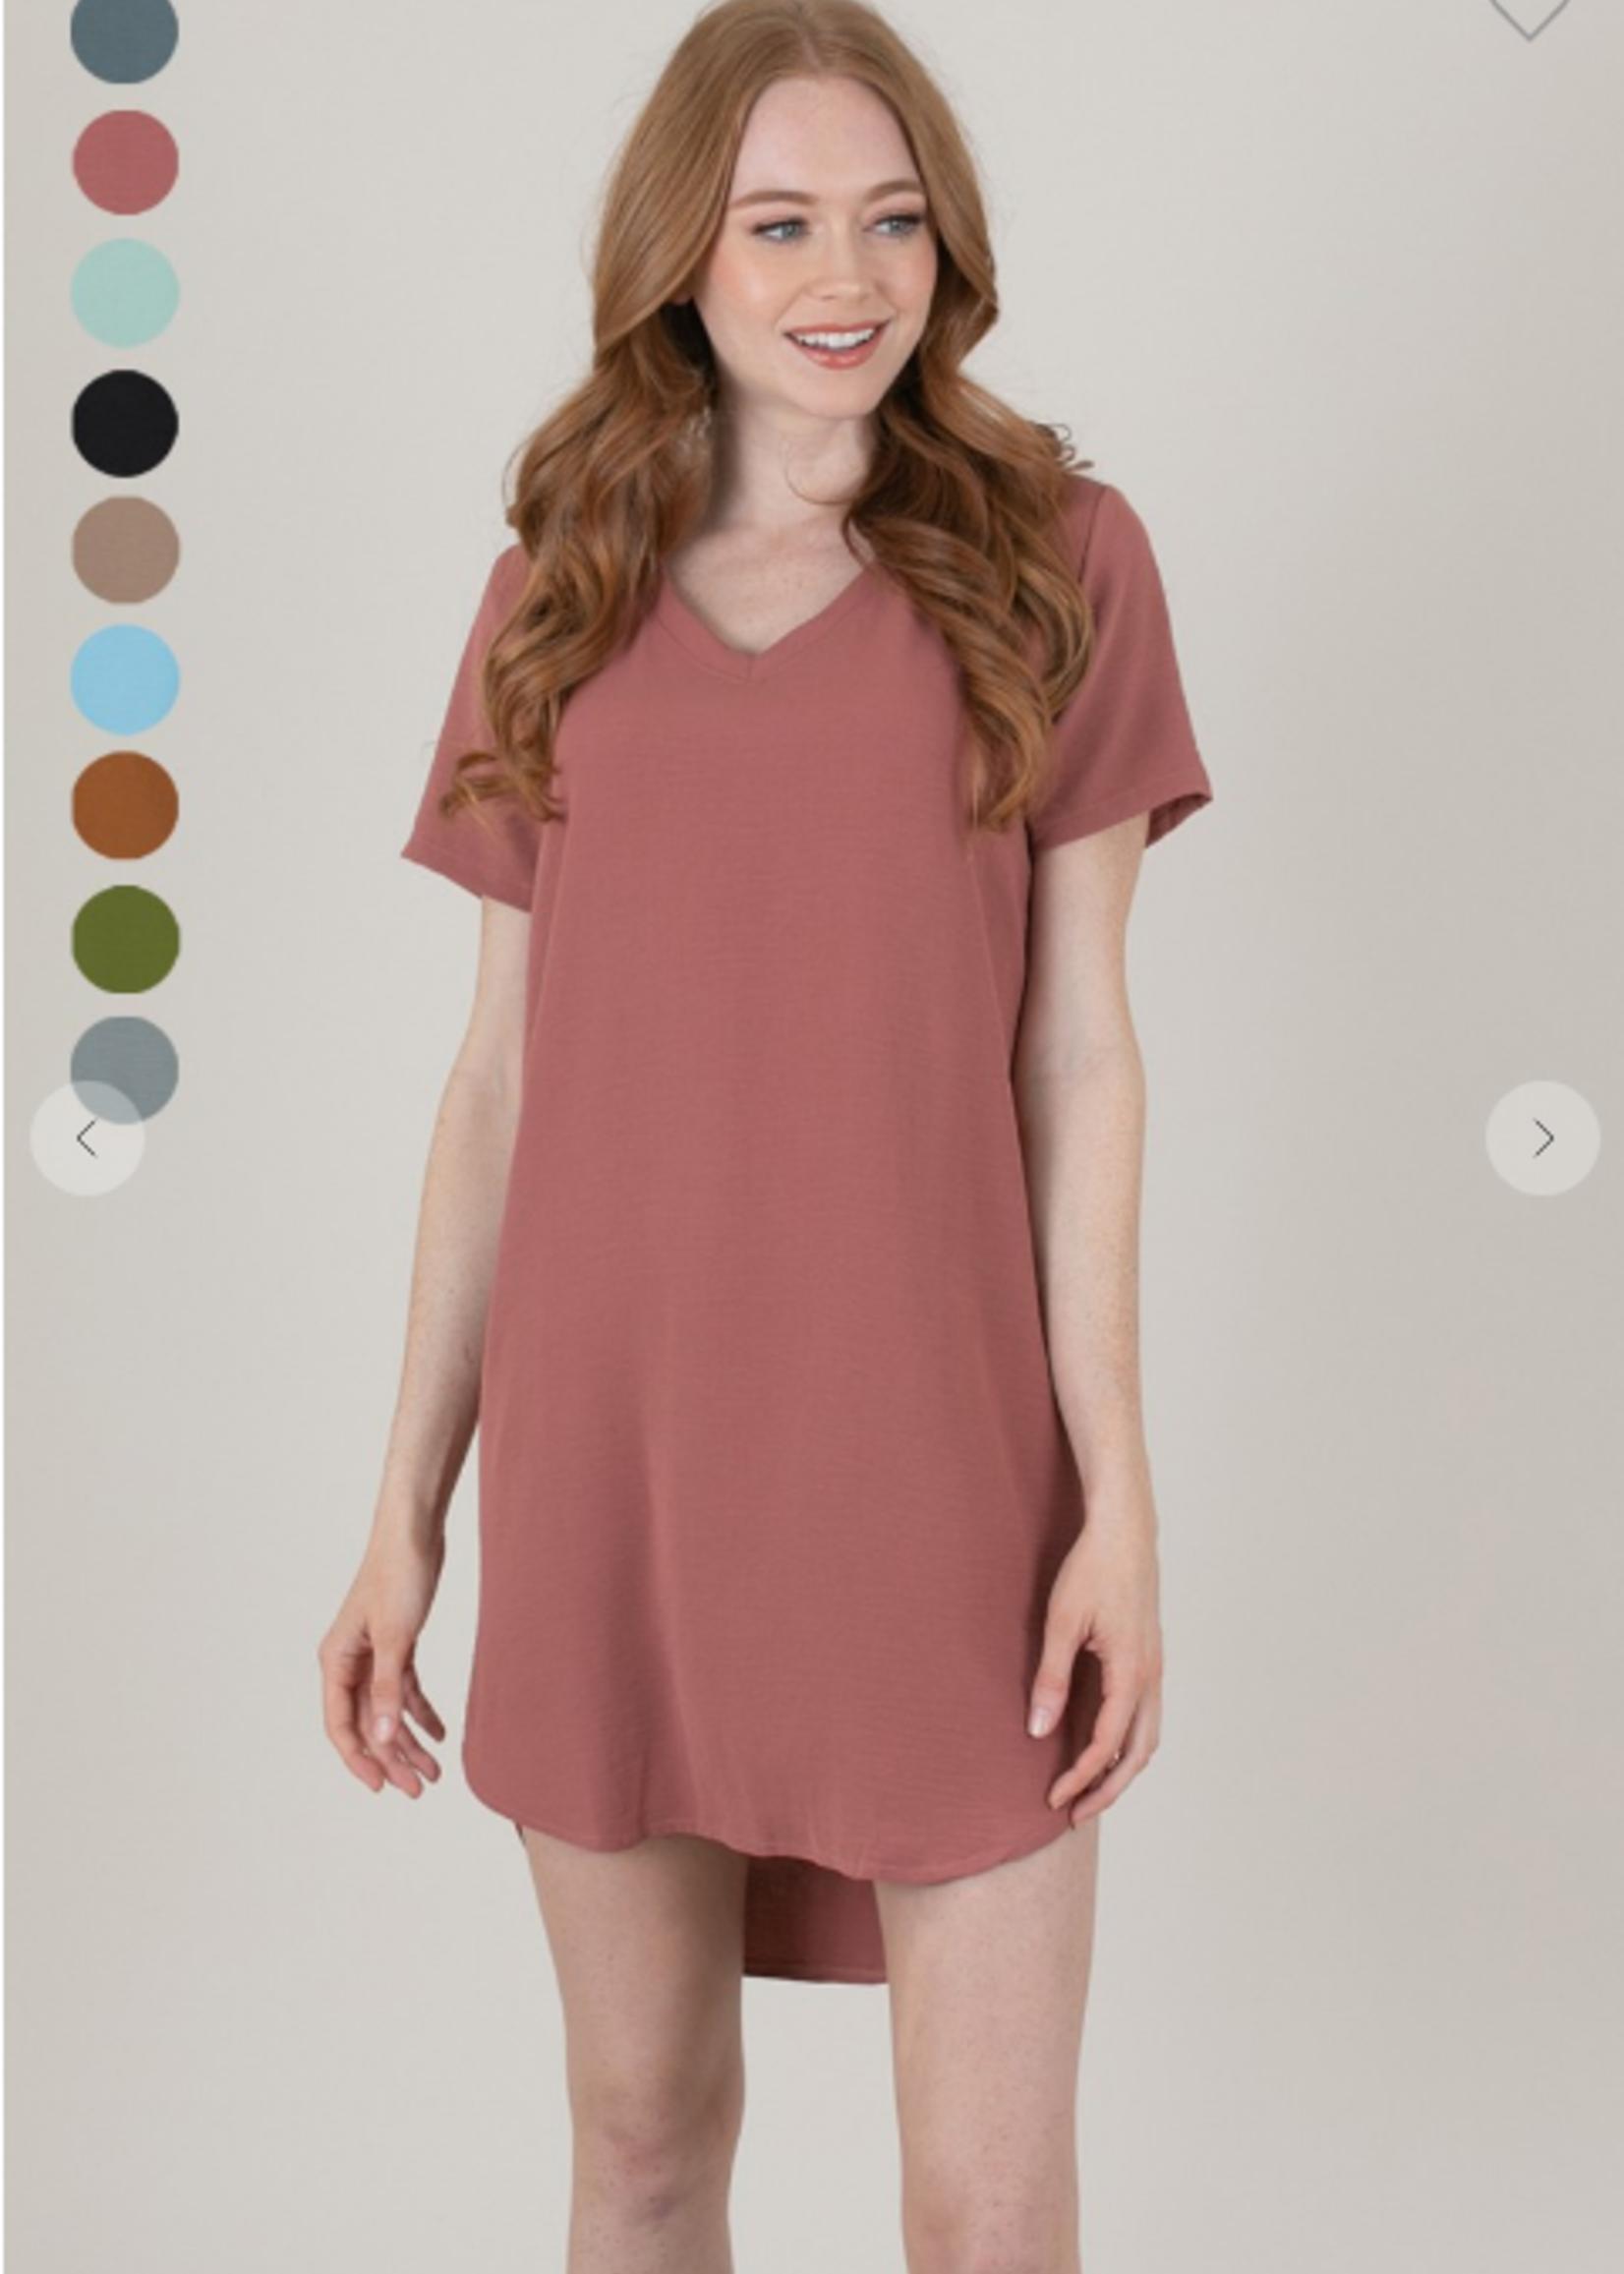 Woven V Neck Dress - Mauve